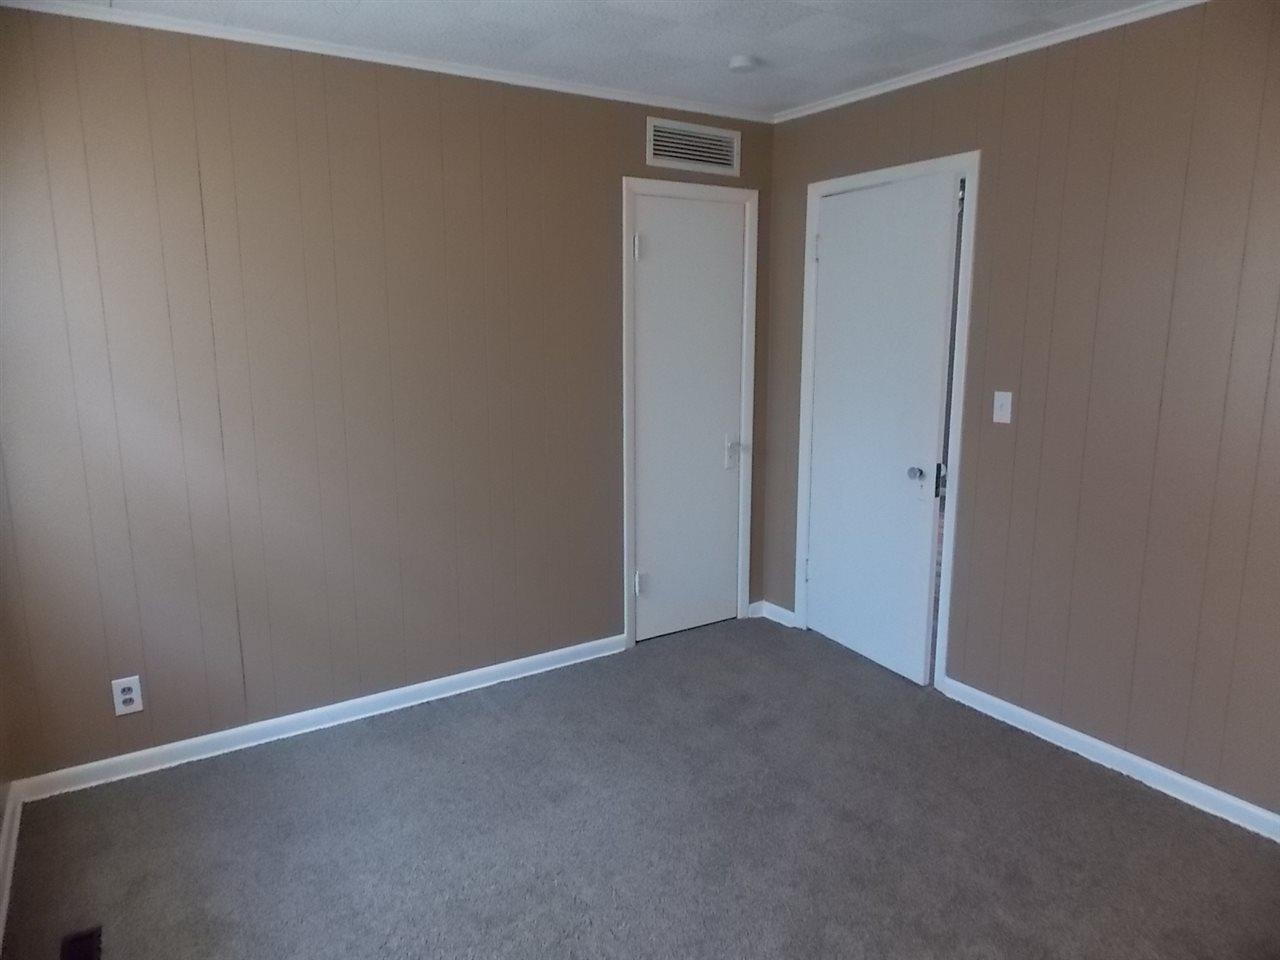 For Sale: 2137 N JACKSON AVE, Wichita KS